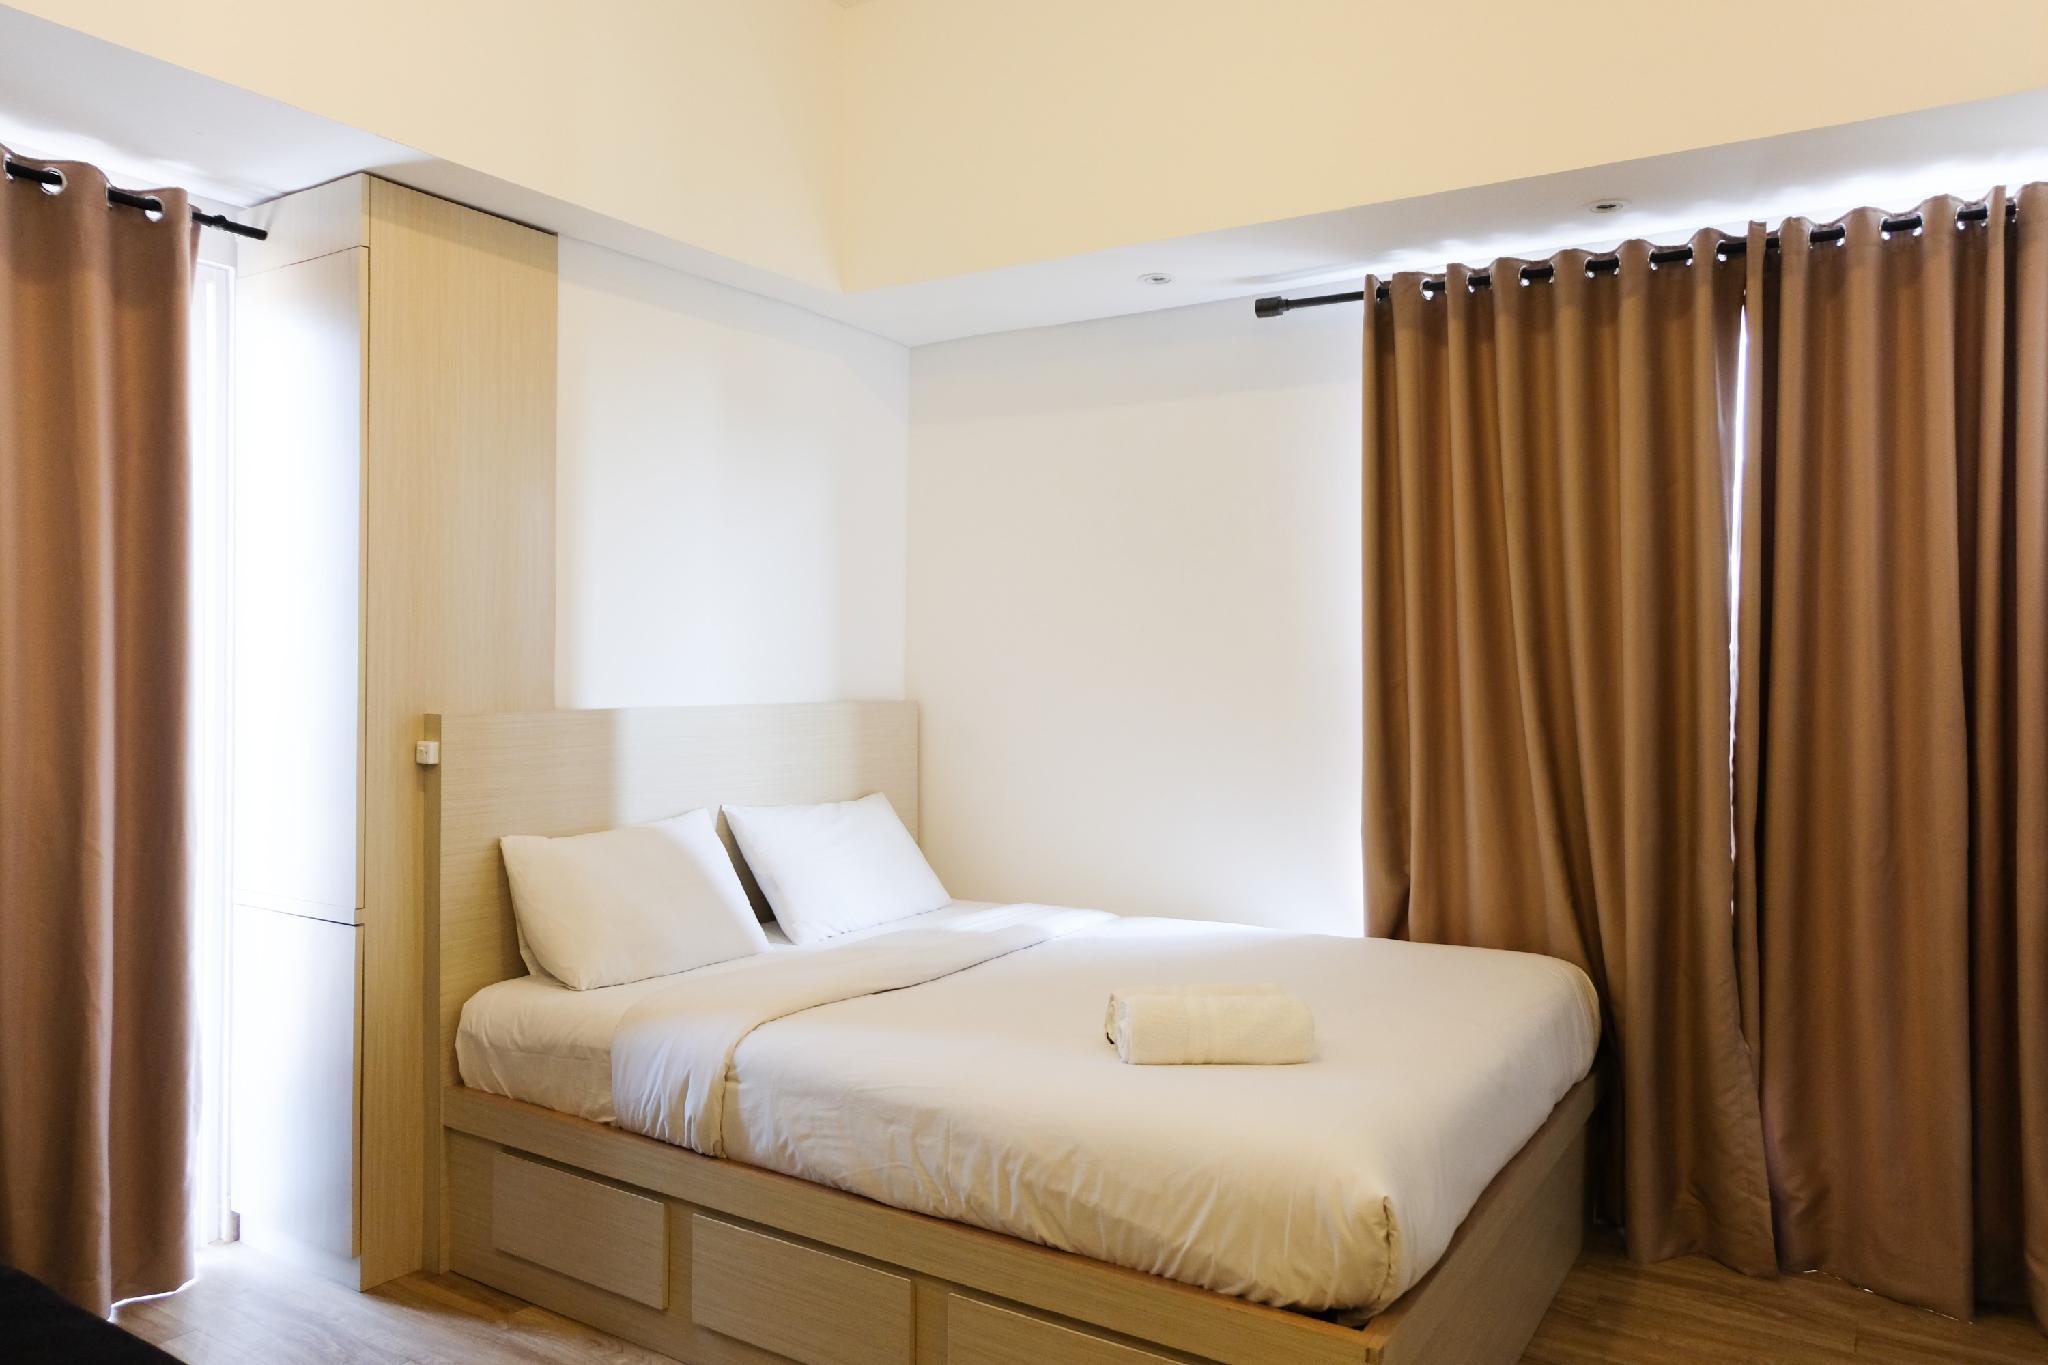 Cozy And Compact Casa De Parco Studio Apartment By Travelio